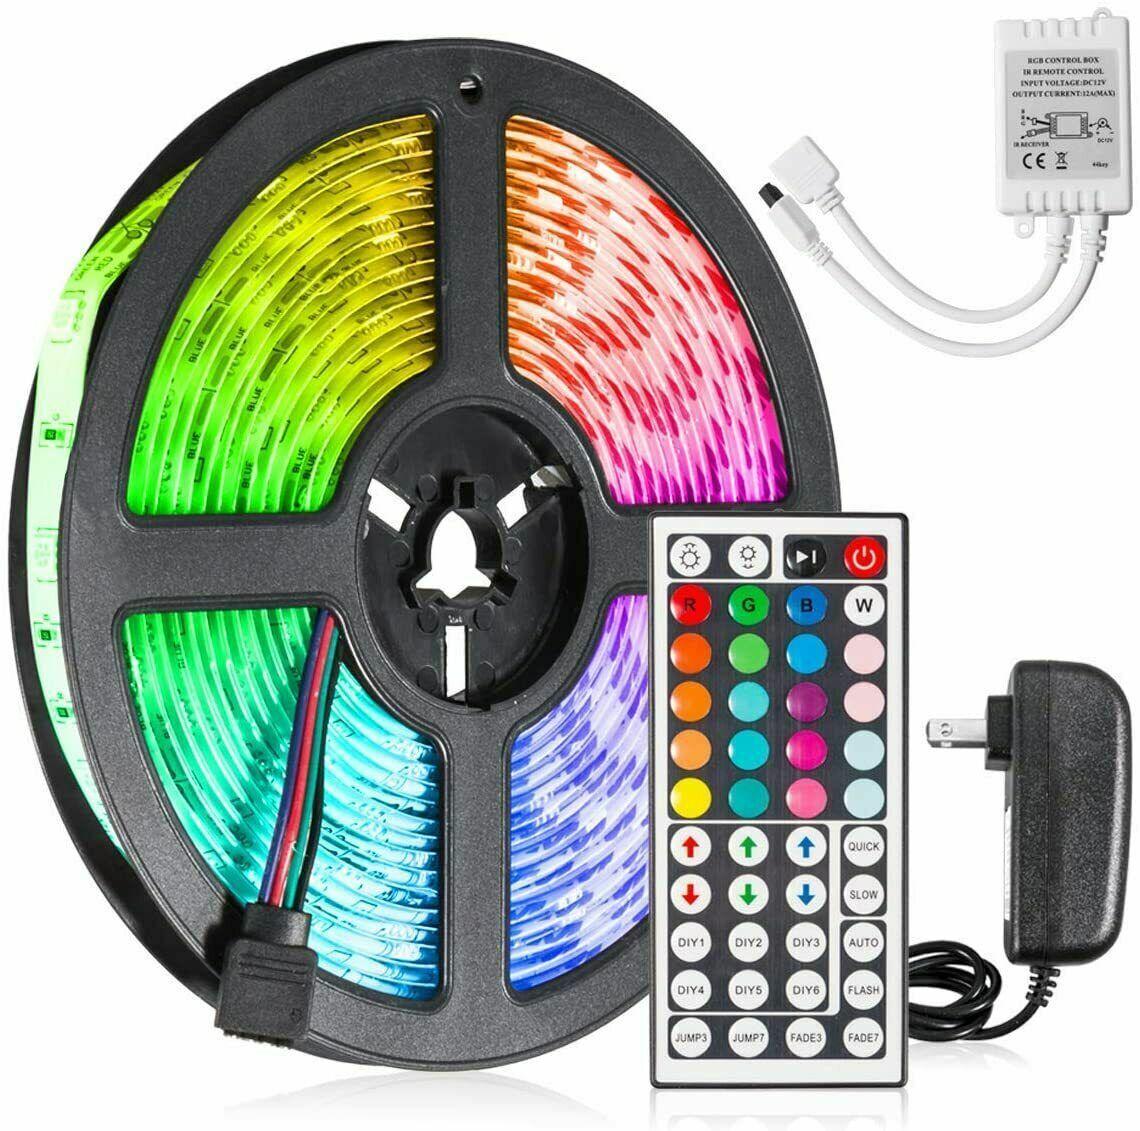 Led Strip Lighting 5M 16.4 Ft 5050 RGB 150 LEDs Flexible Color Changing Light Home & Garden